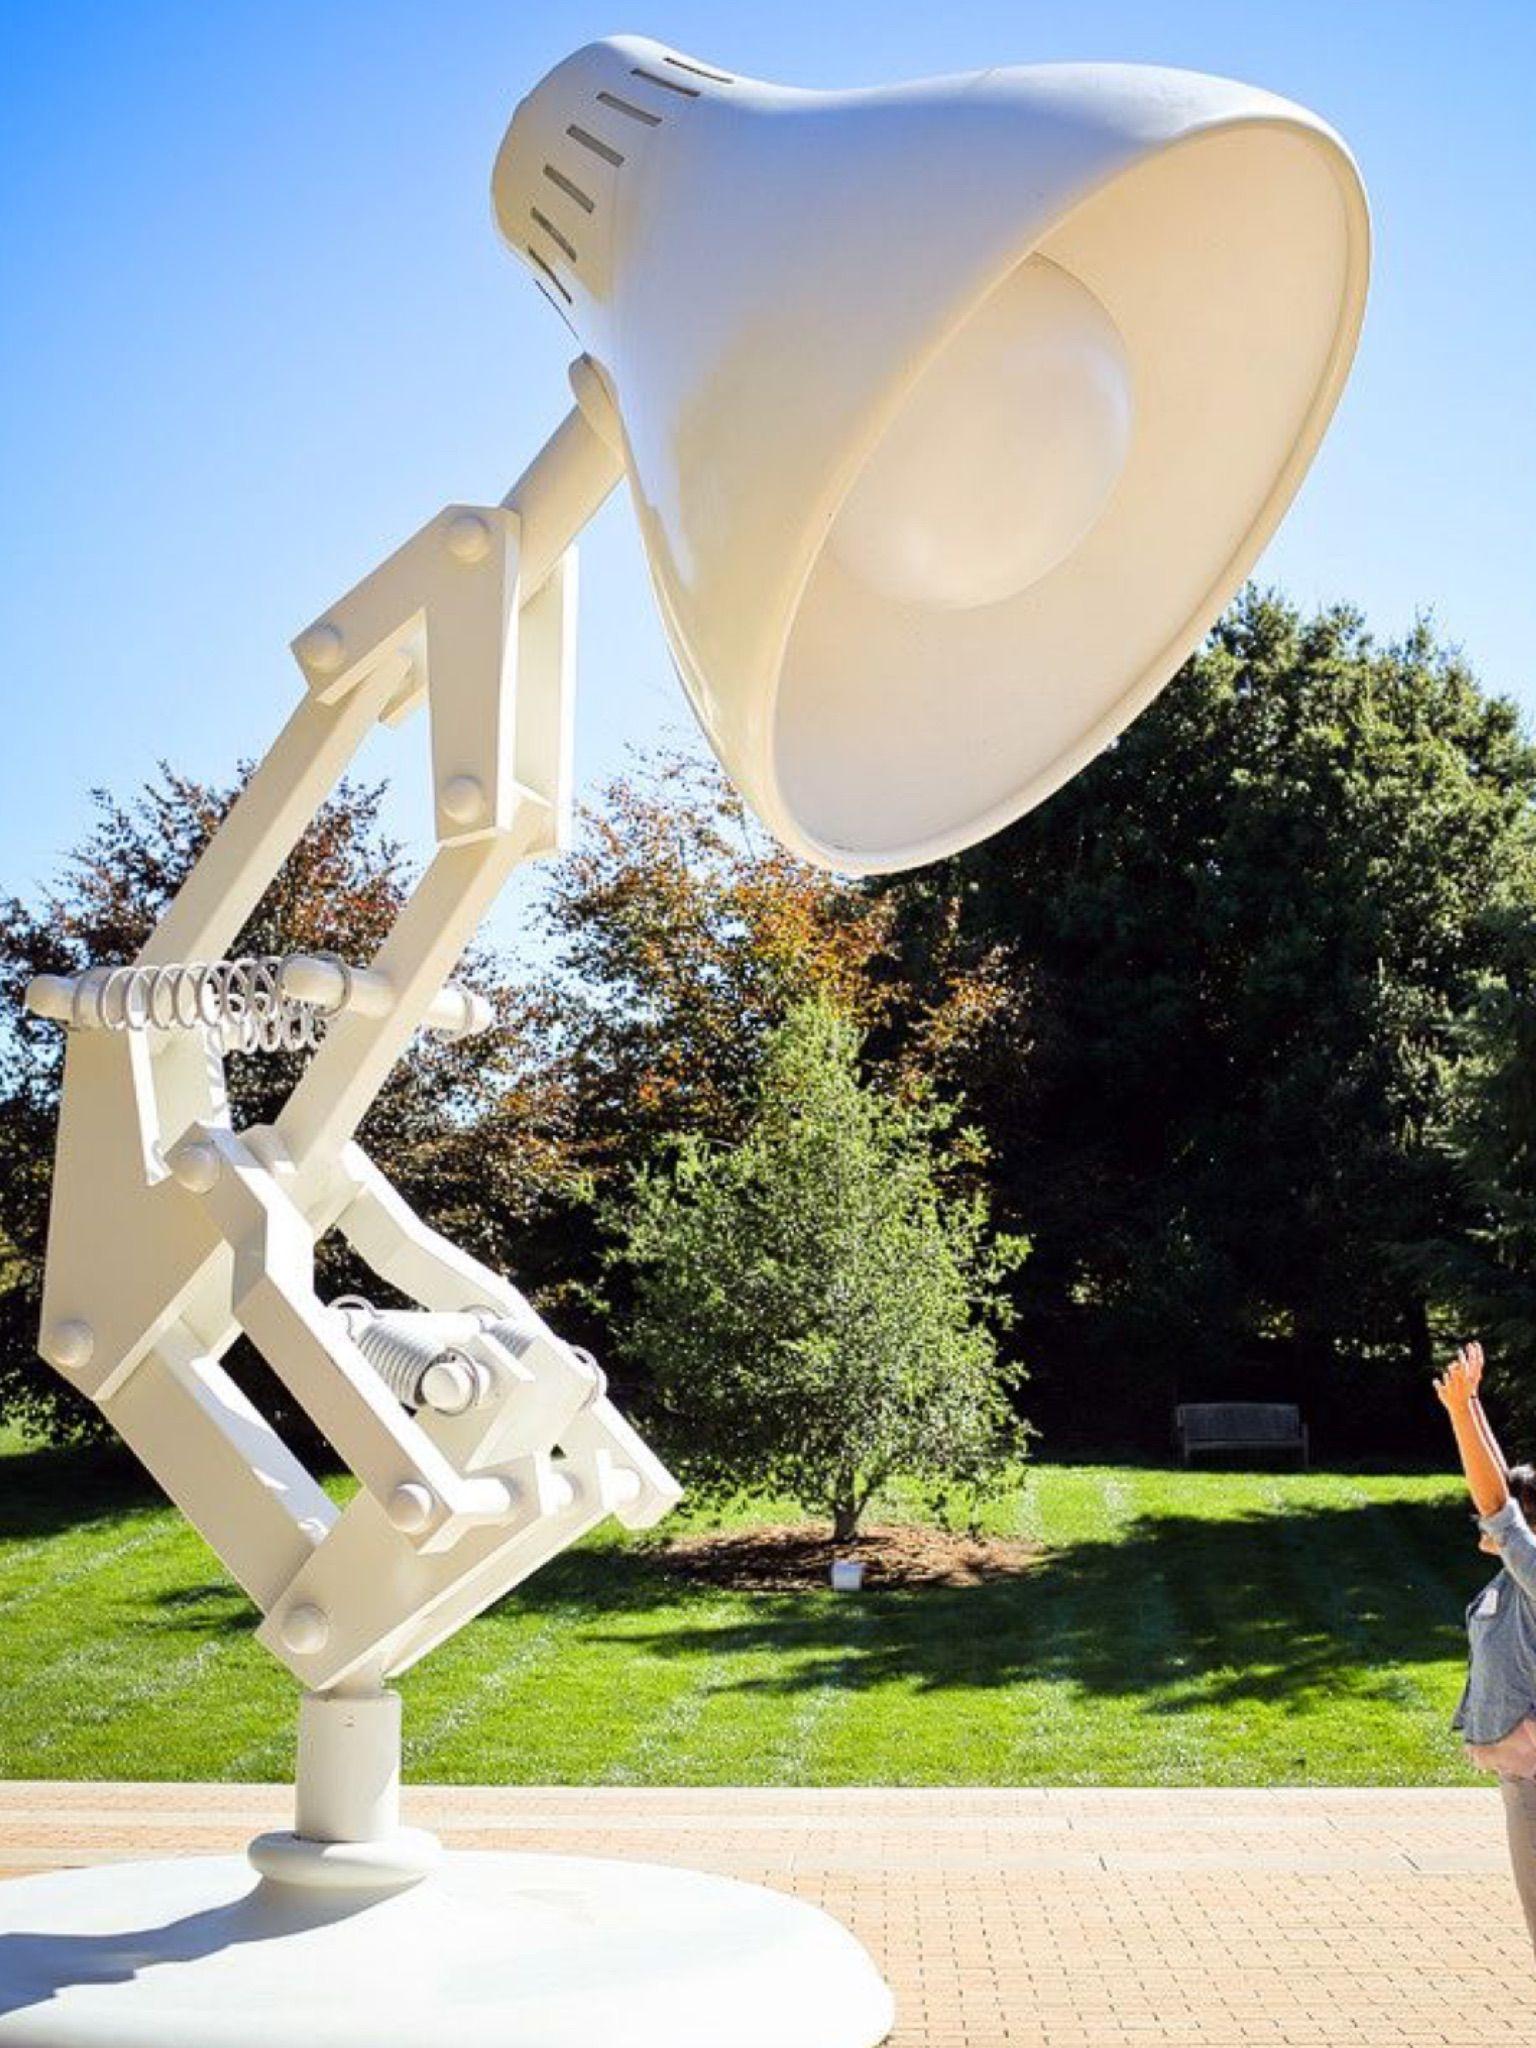 Pin By Ajodee On Art Cool Oversized Art Animation Studio Pixar Lamp Pixar